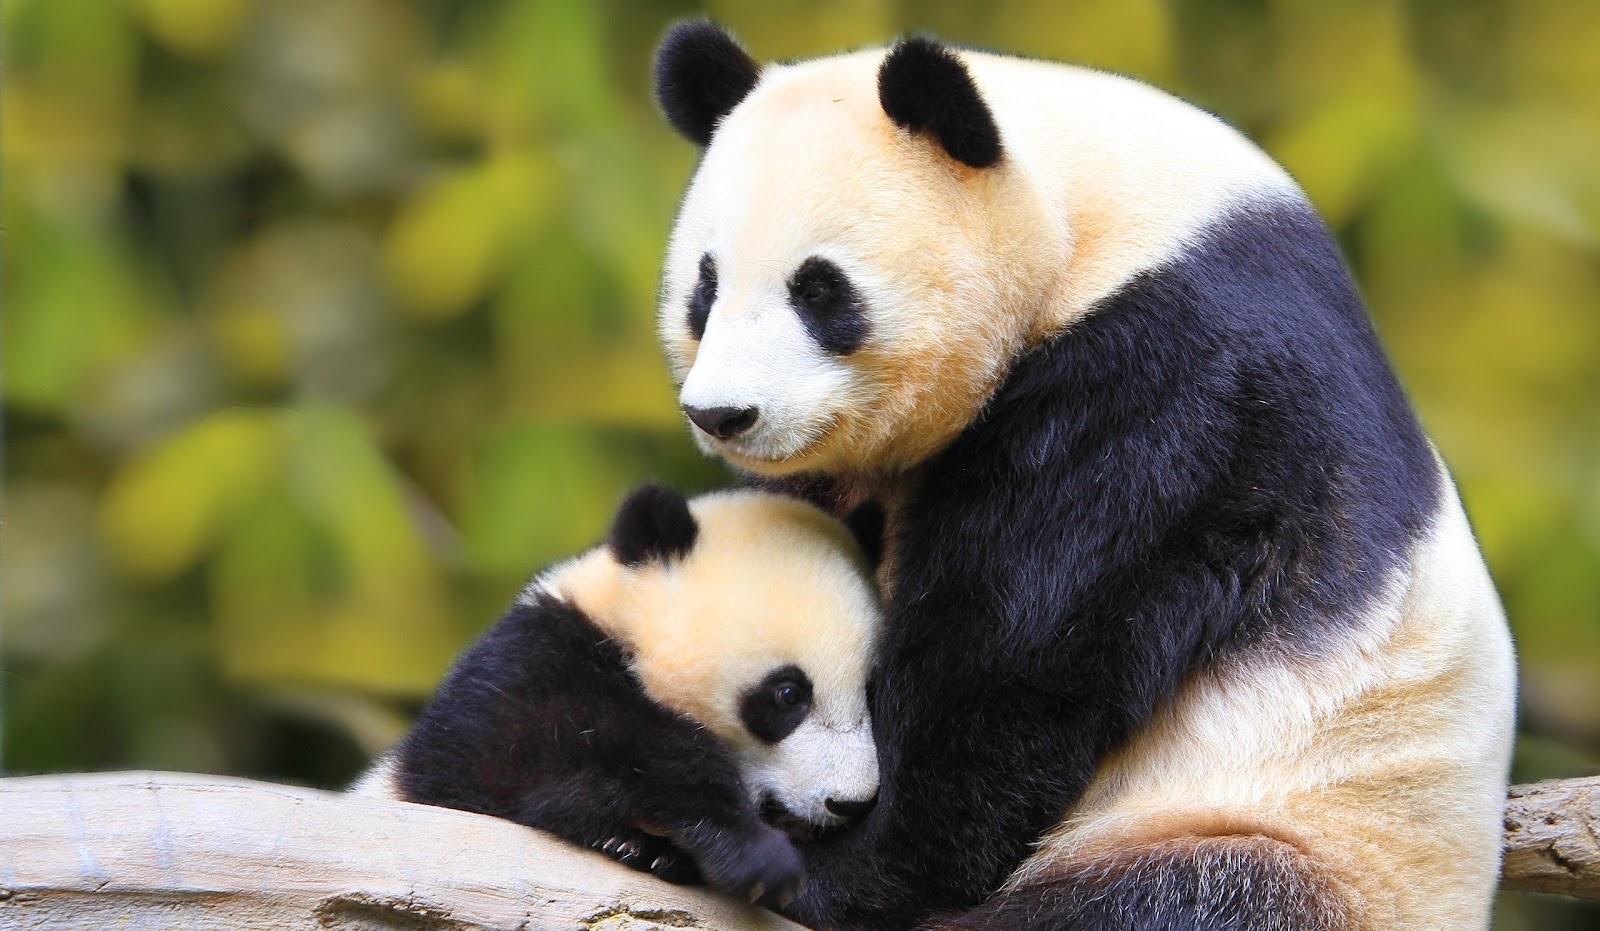 Panda Full HD Wallpapers Panda Wallpapers Panda HD Desktop 1600x931